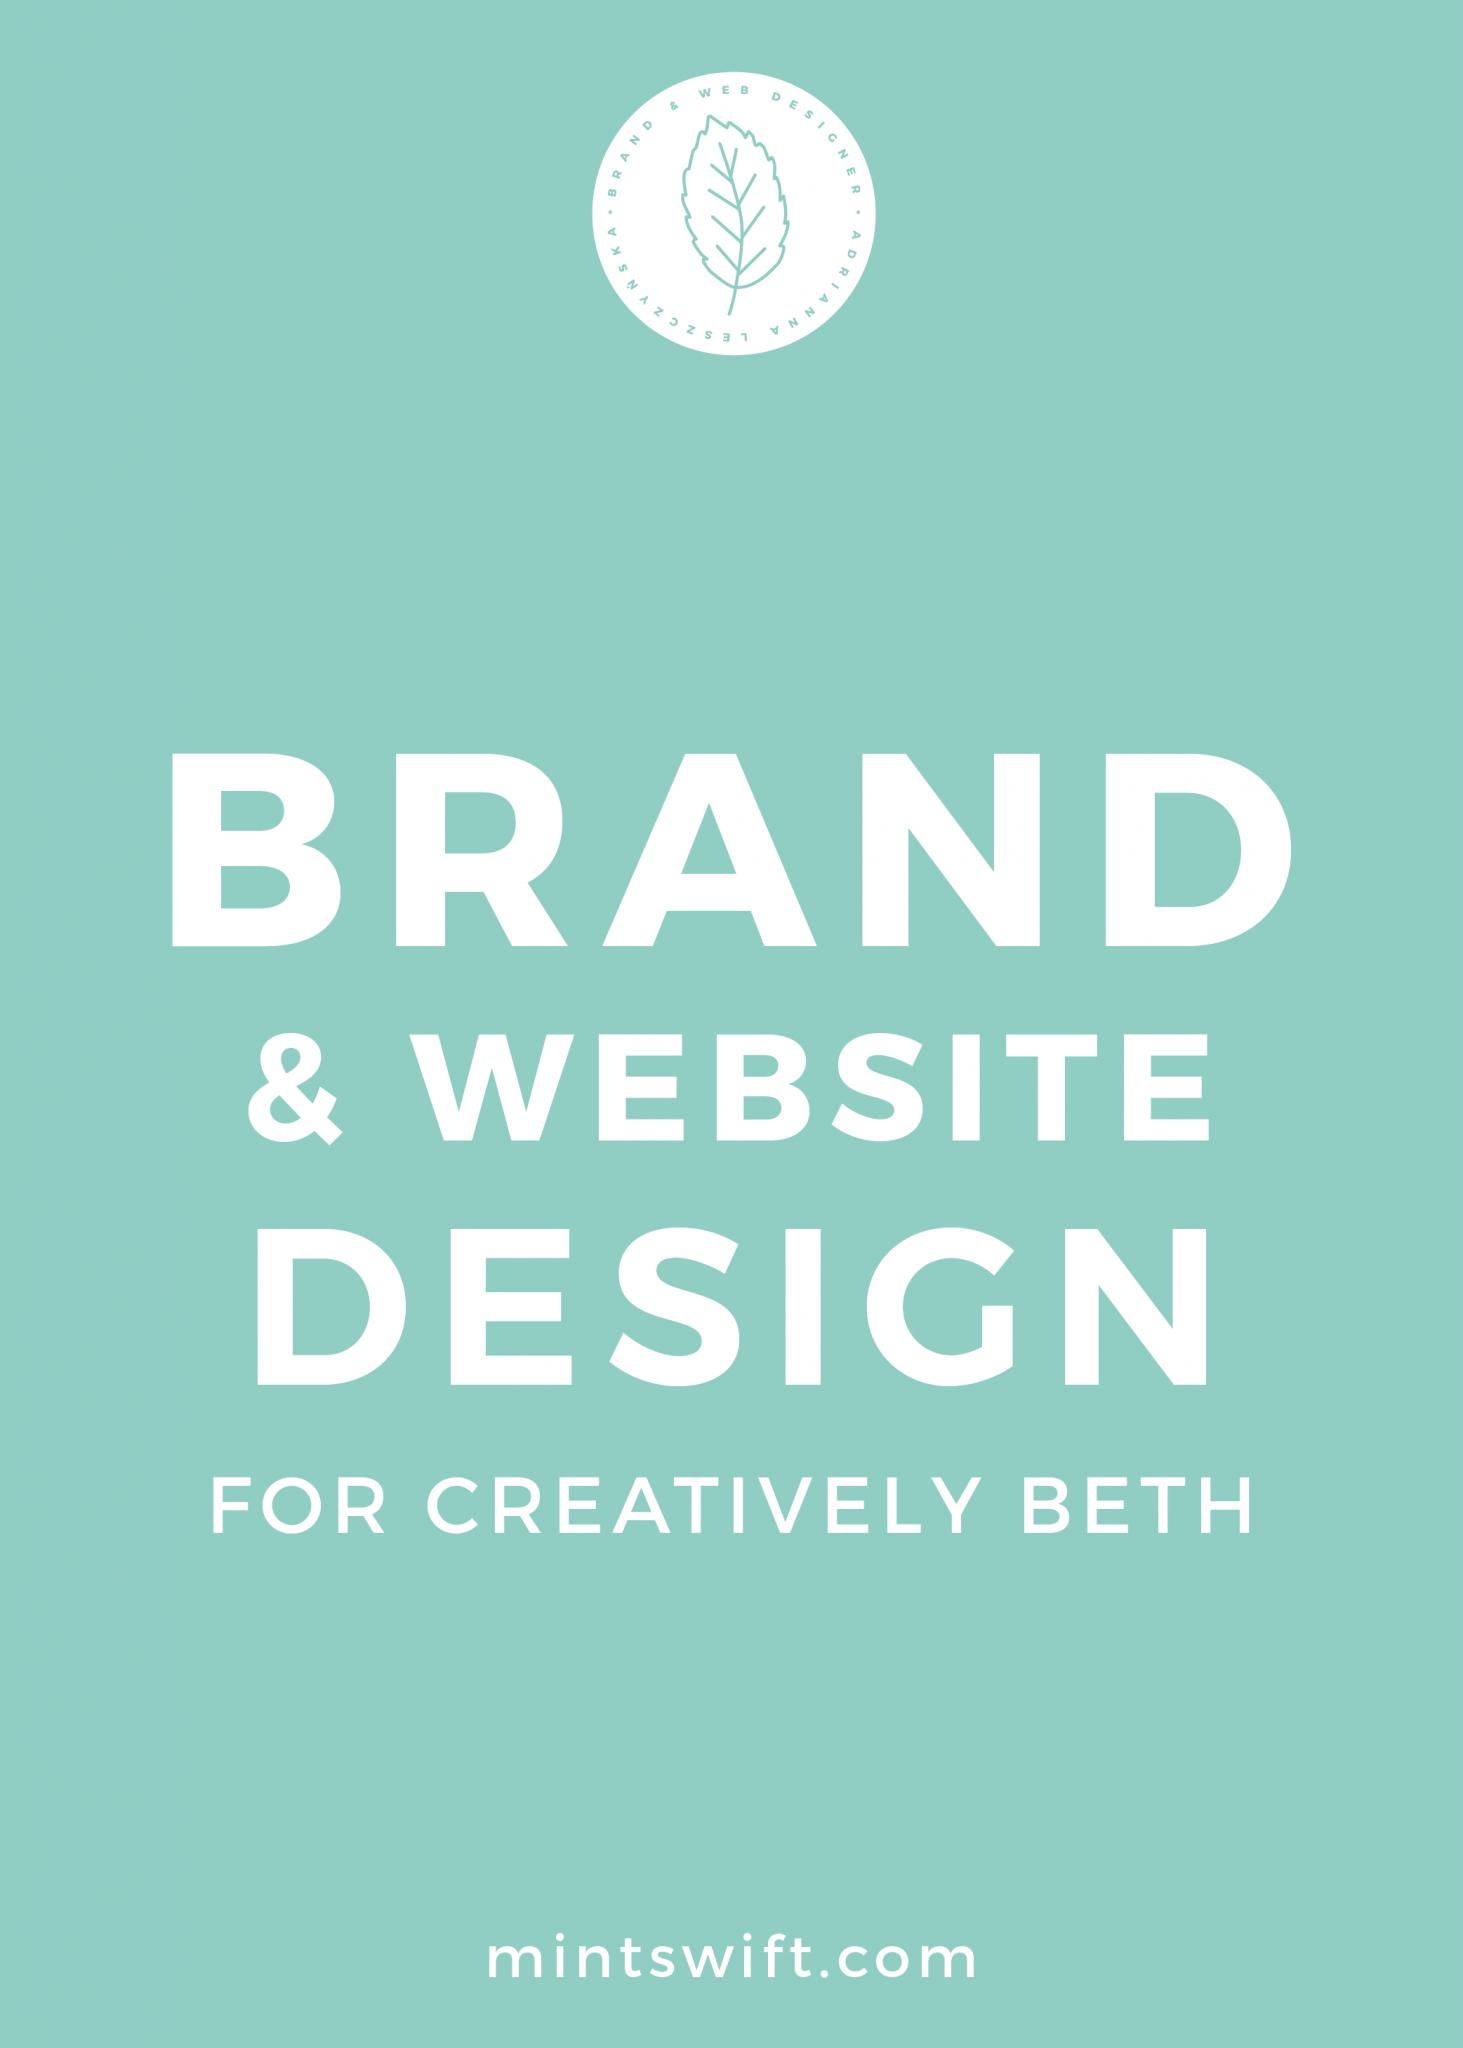 Brand & Website Design for Creatively Beth - MintSwift